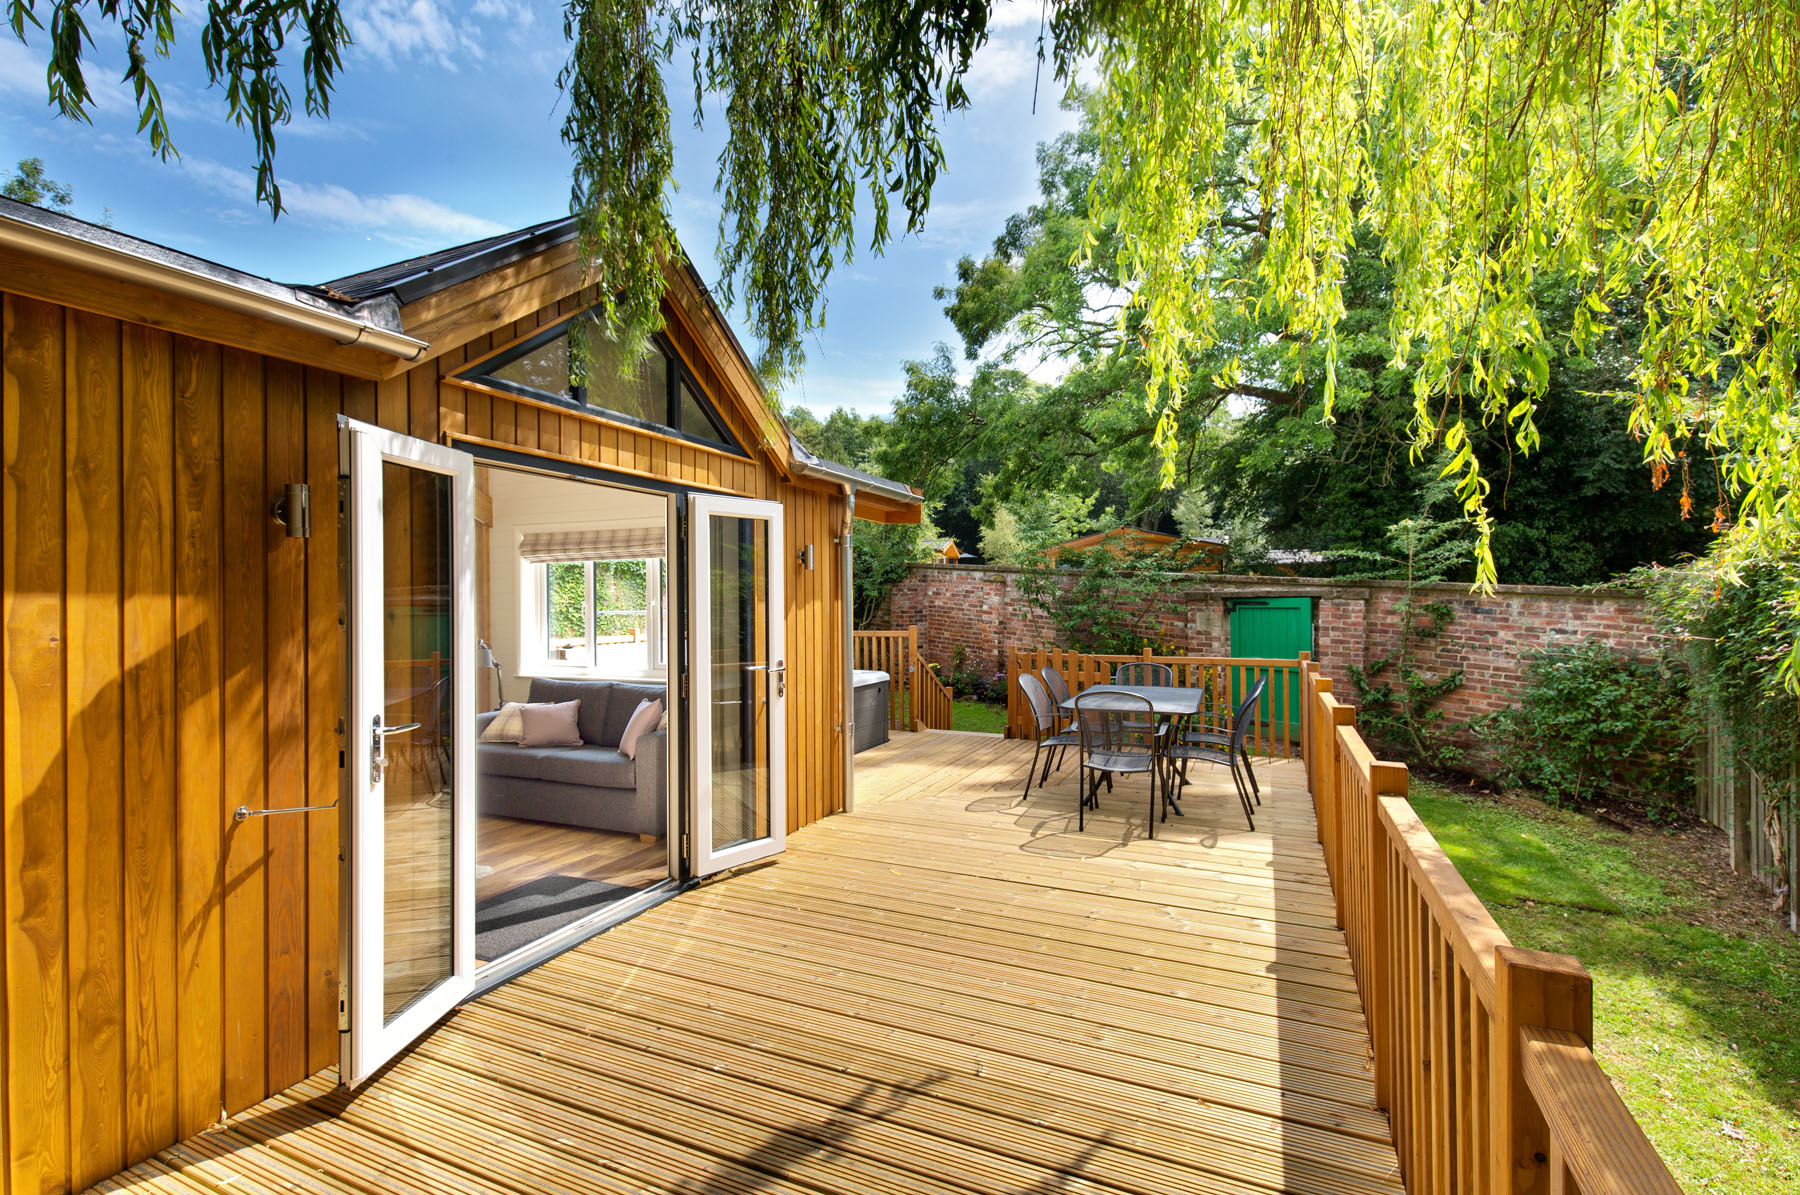 Lodge patio and open doors